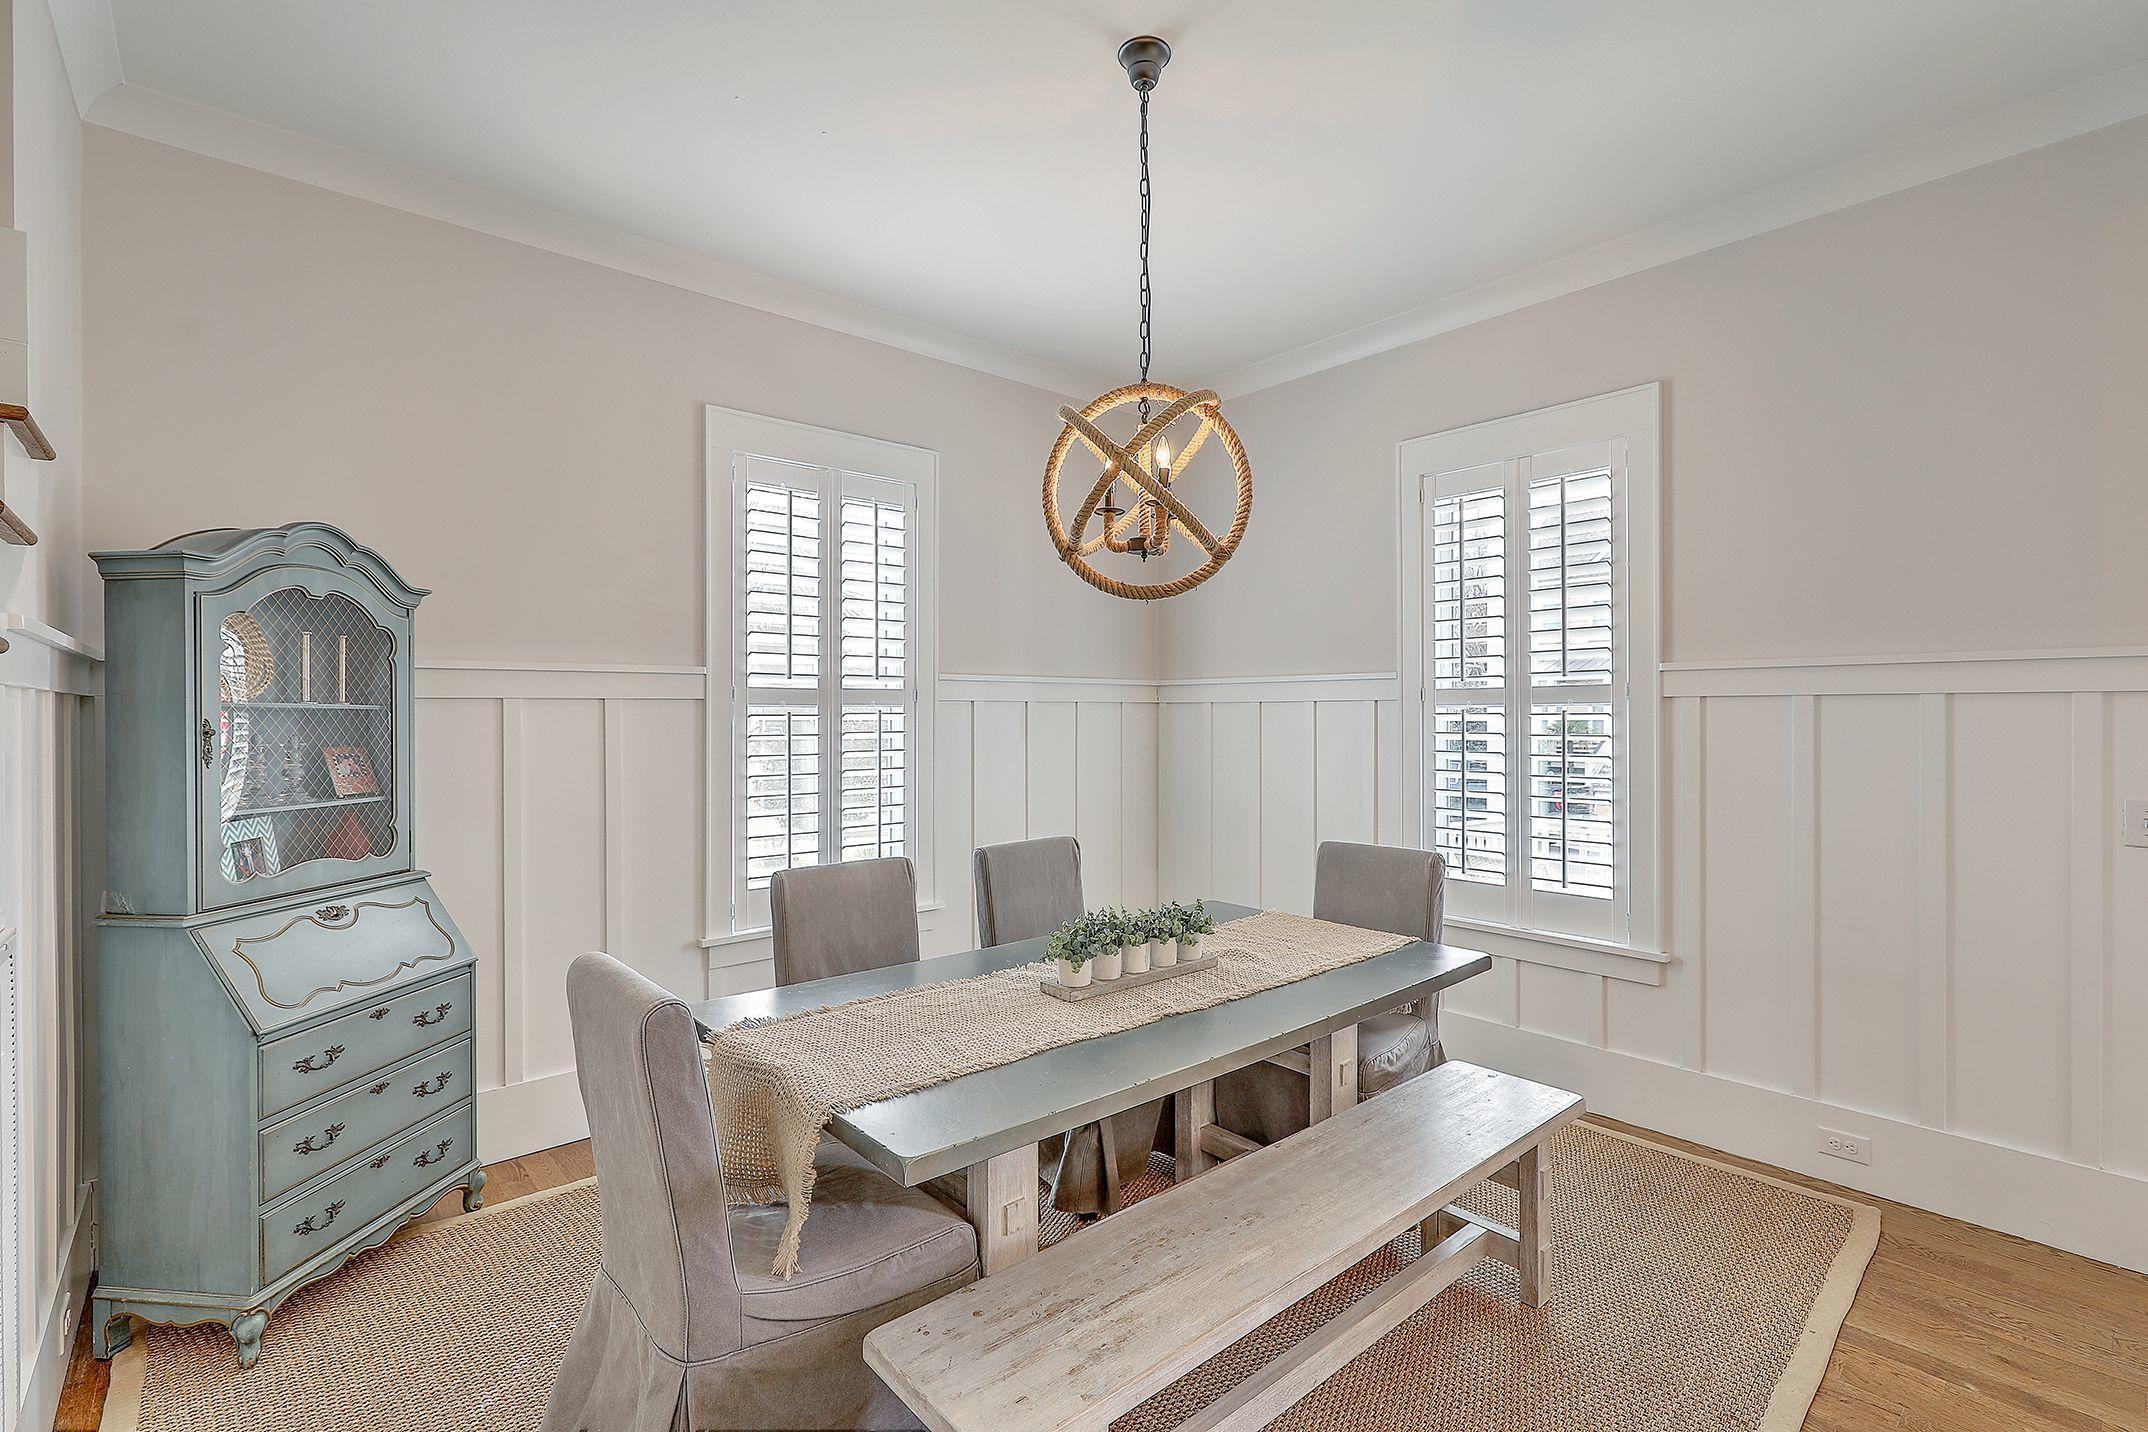 Carolina Park Homes For Sale - 1466 Gunnison, Mount Pleasant, SC - 5